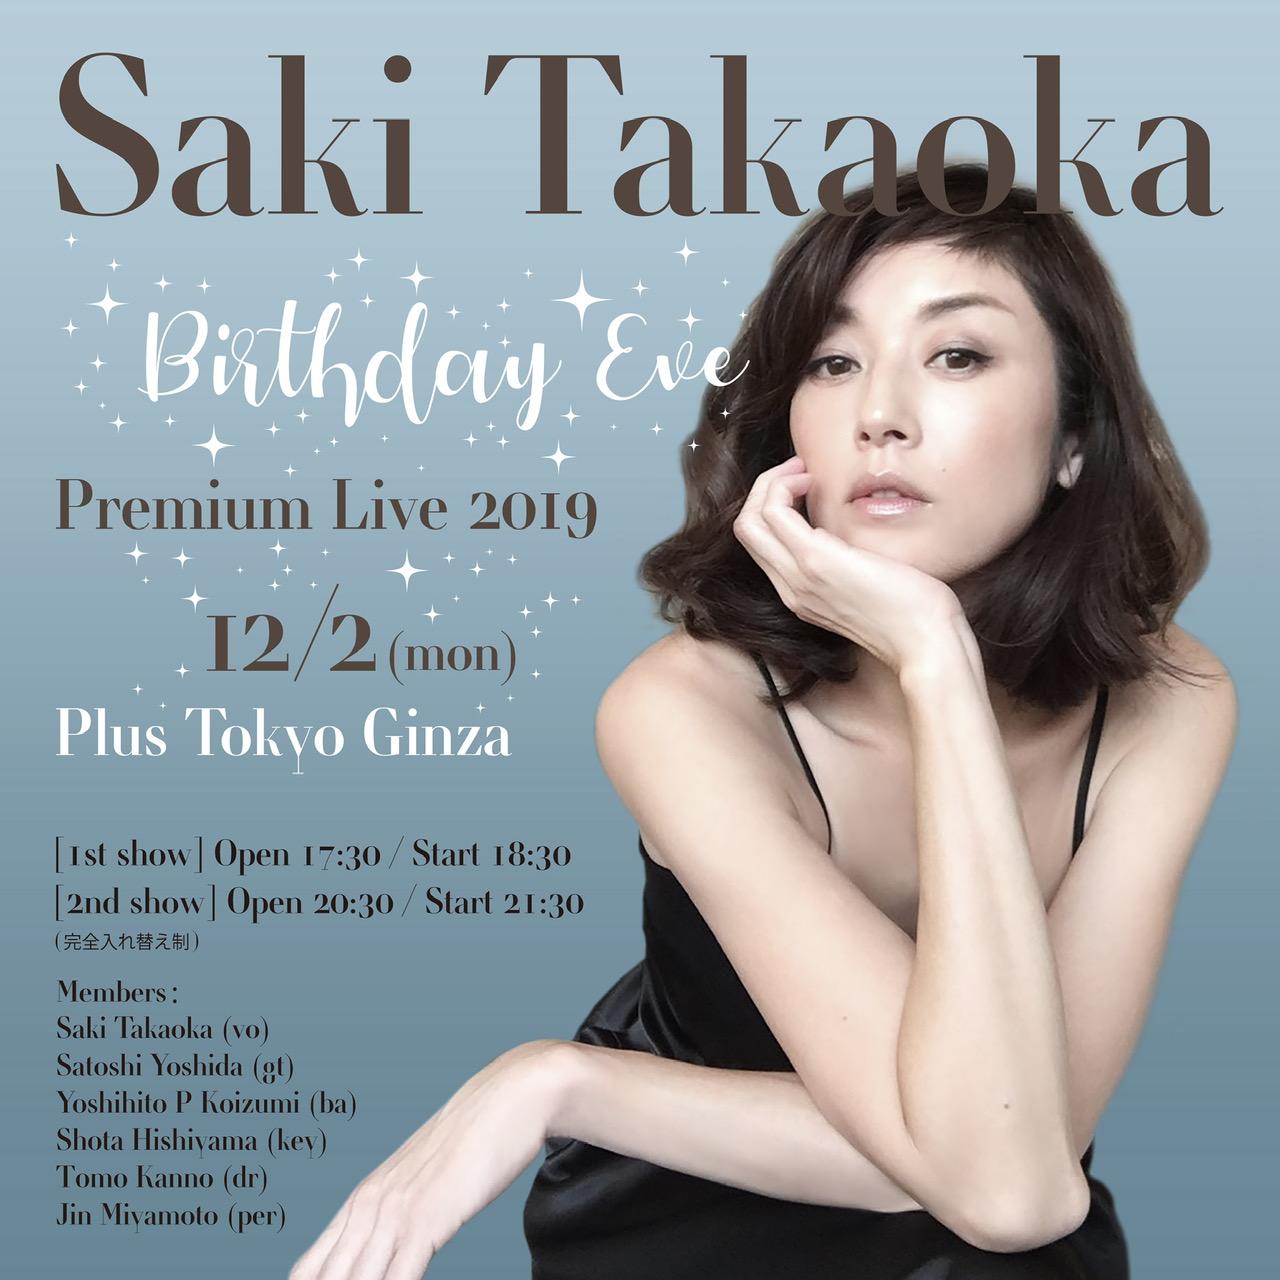 高岡早紀 Birthday Eve Premium Live 2019:1st